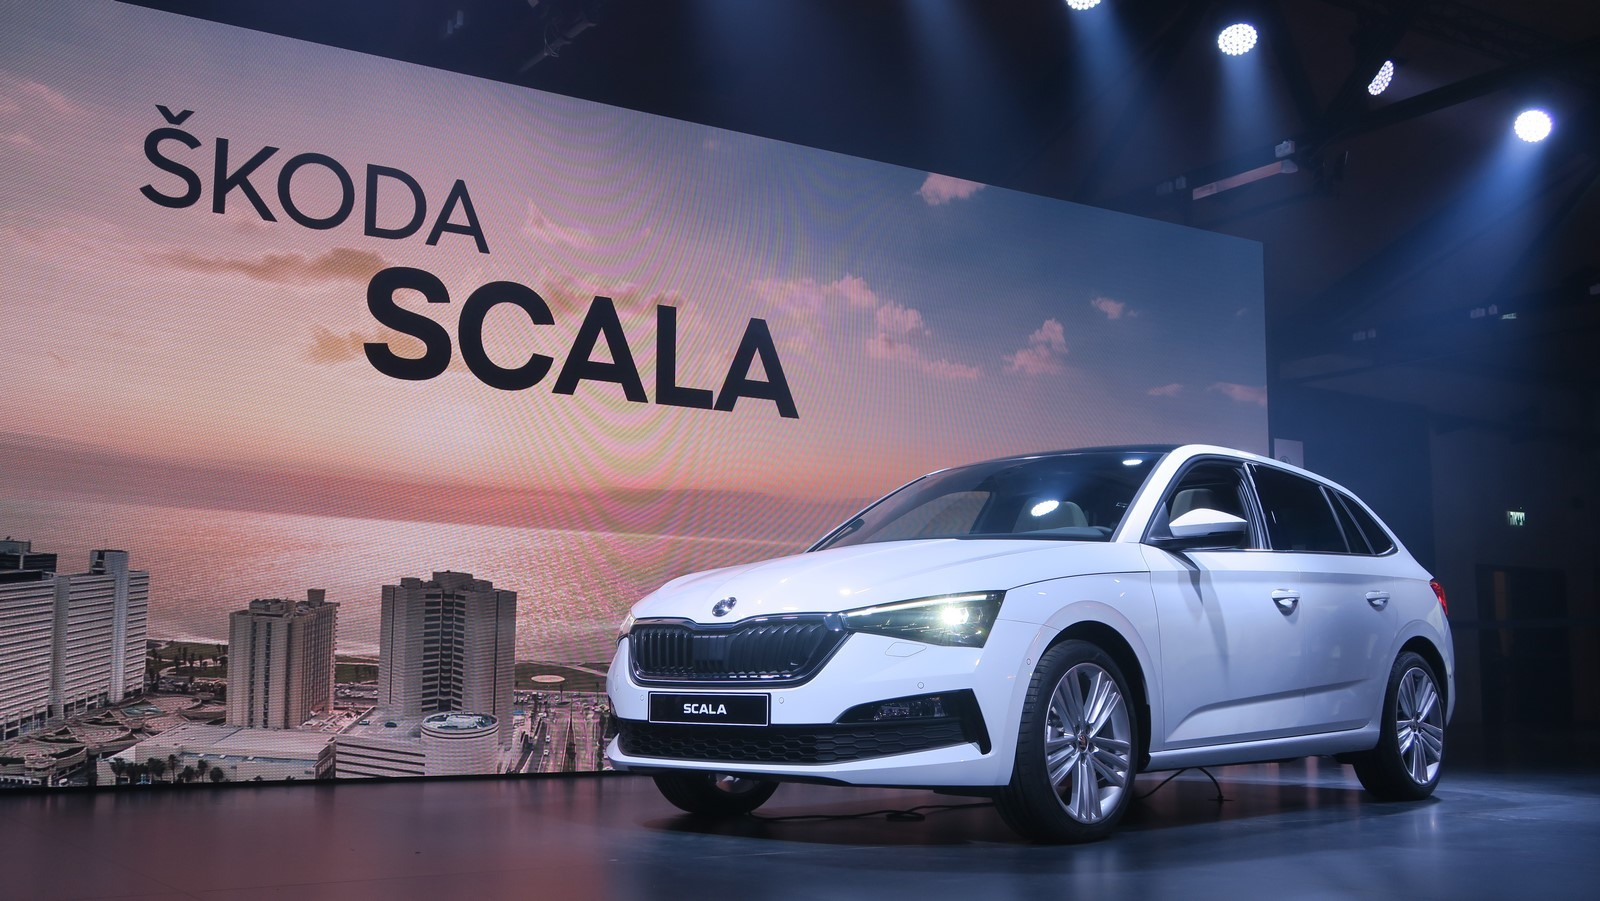 Skoda Scala 2019 TA 2018 FM 99